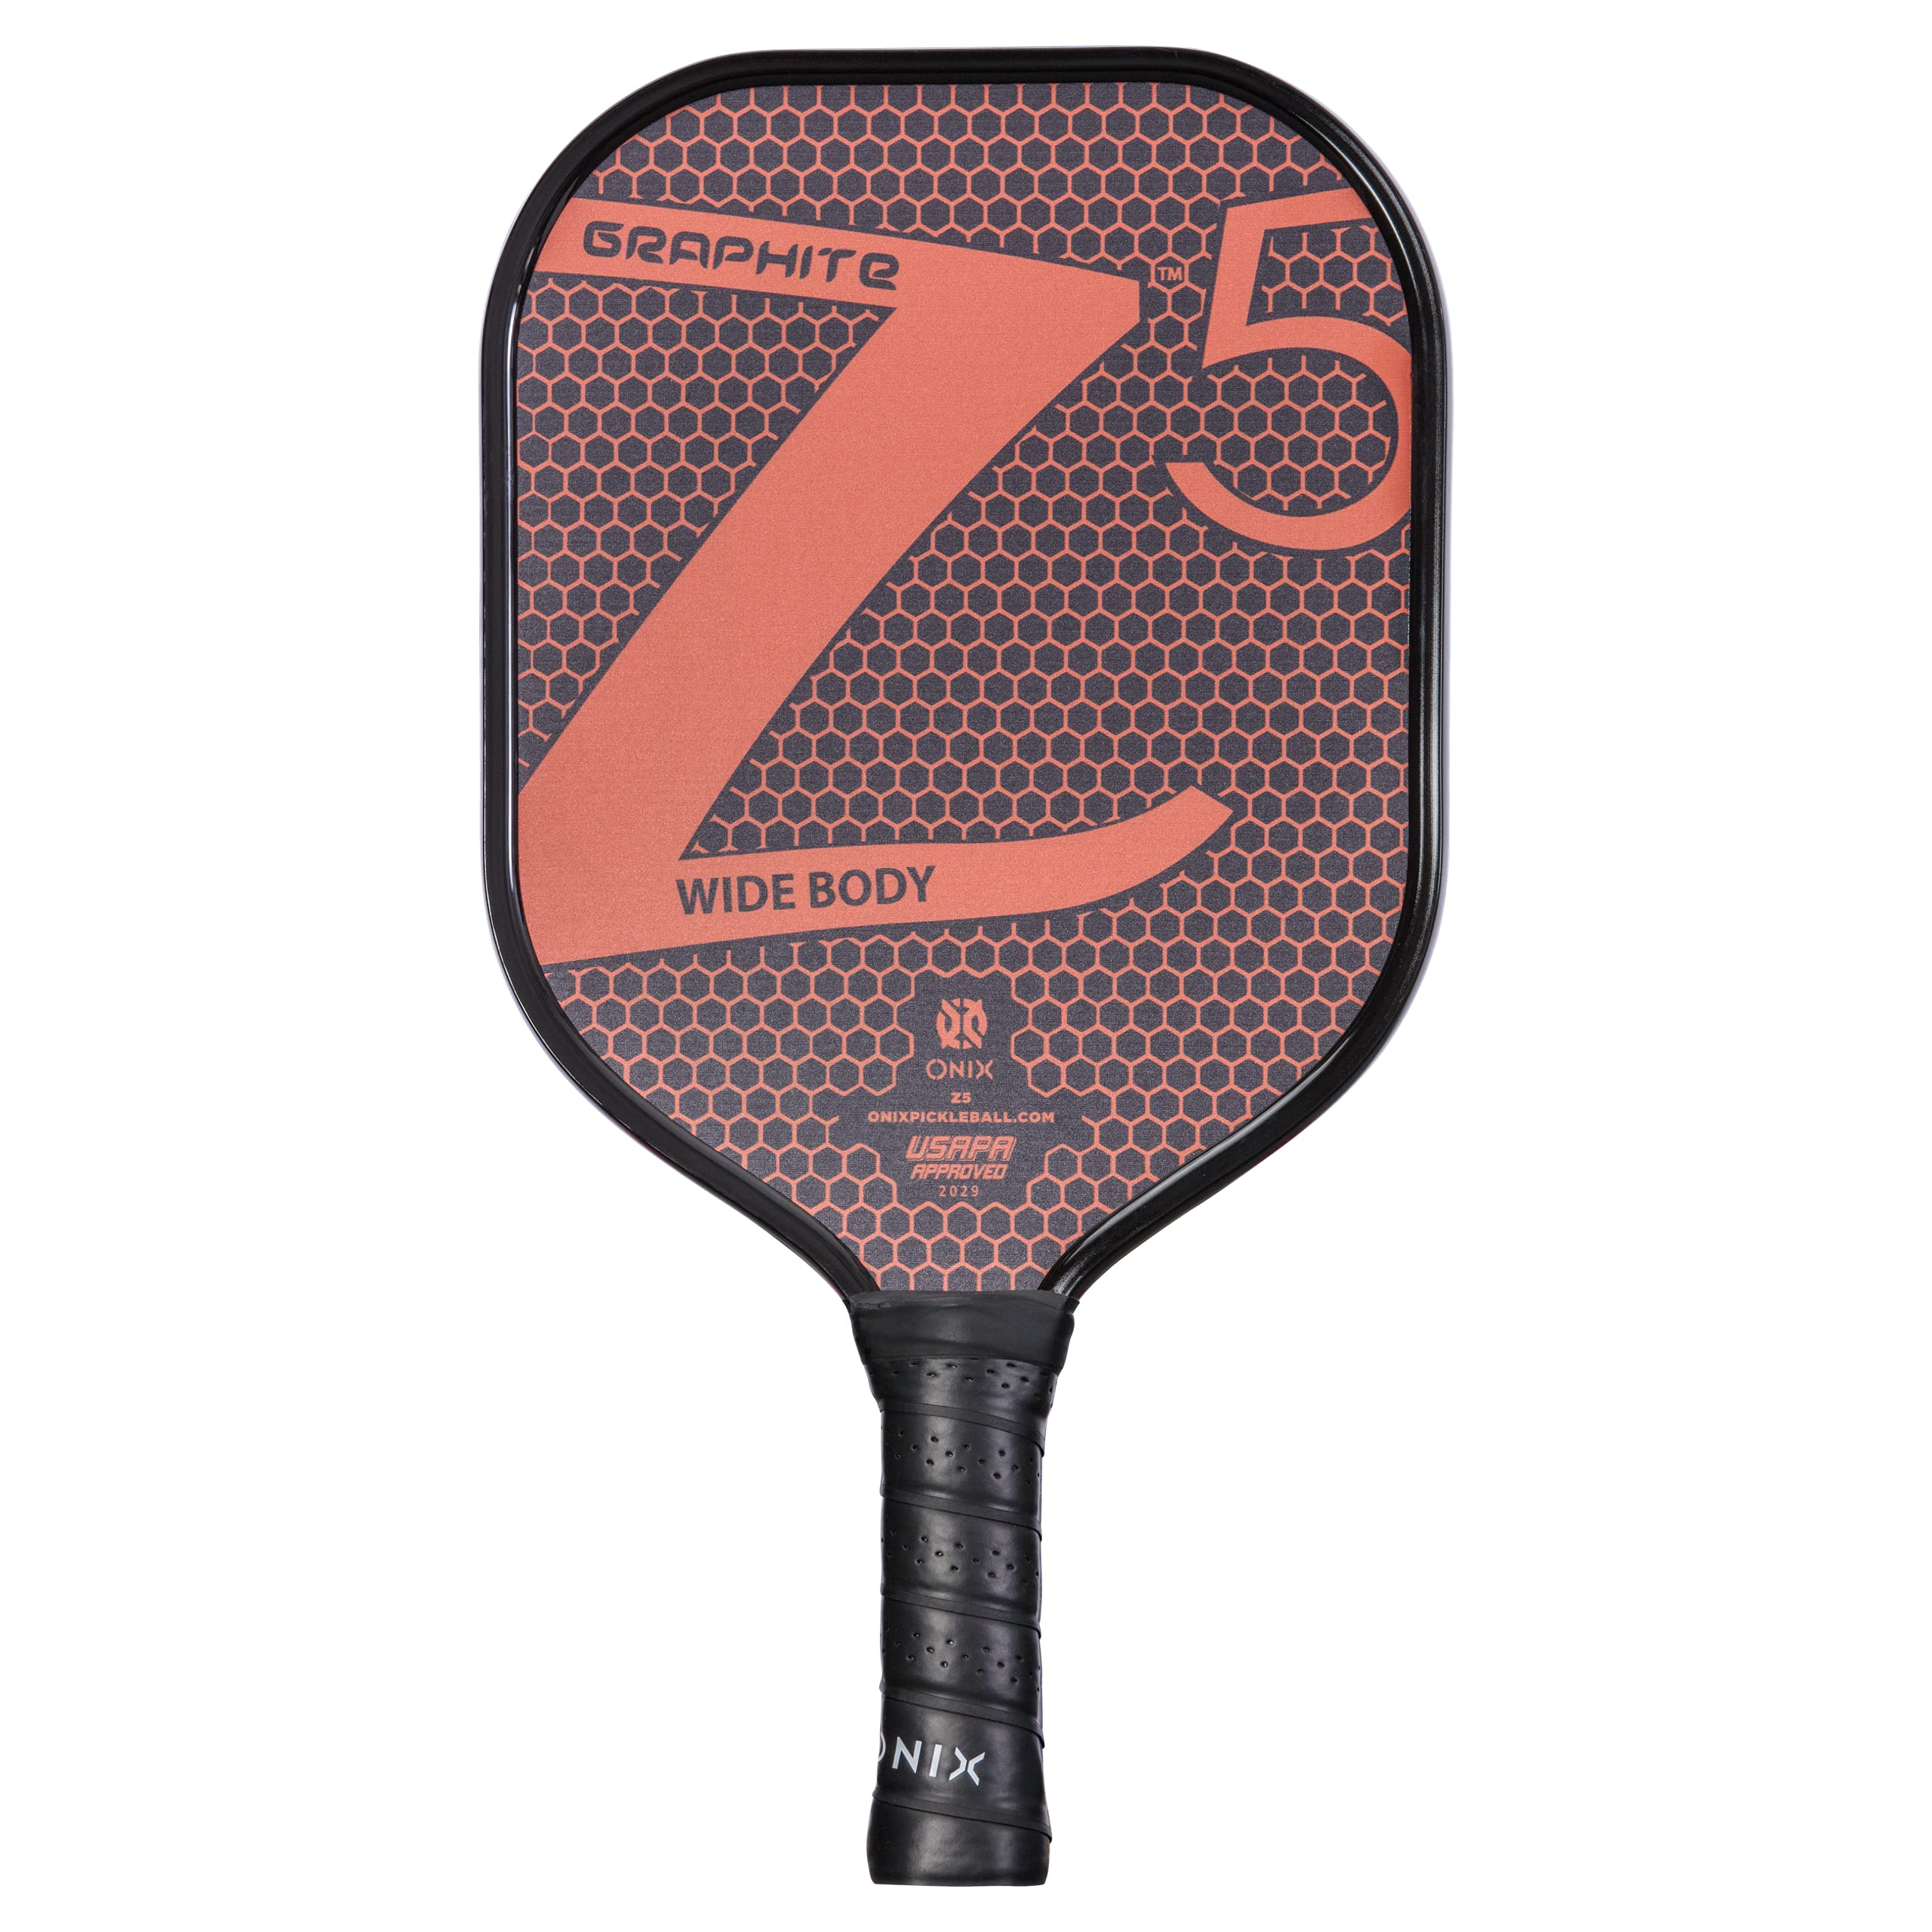 ONIX Graphite Z5 Graphite Carbon Fiber Pickleball Padd -P007